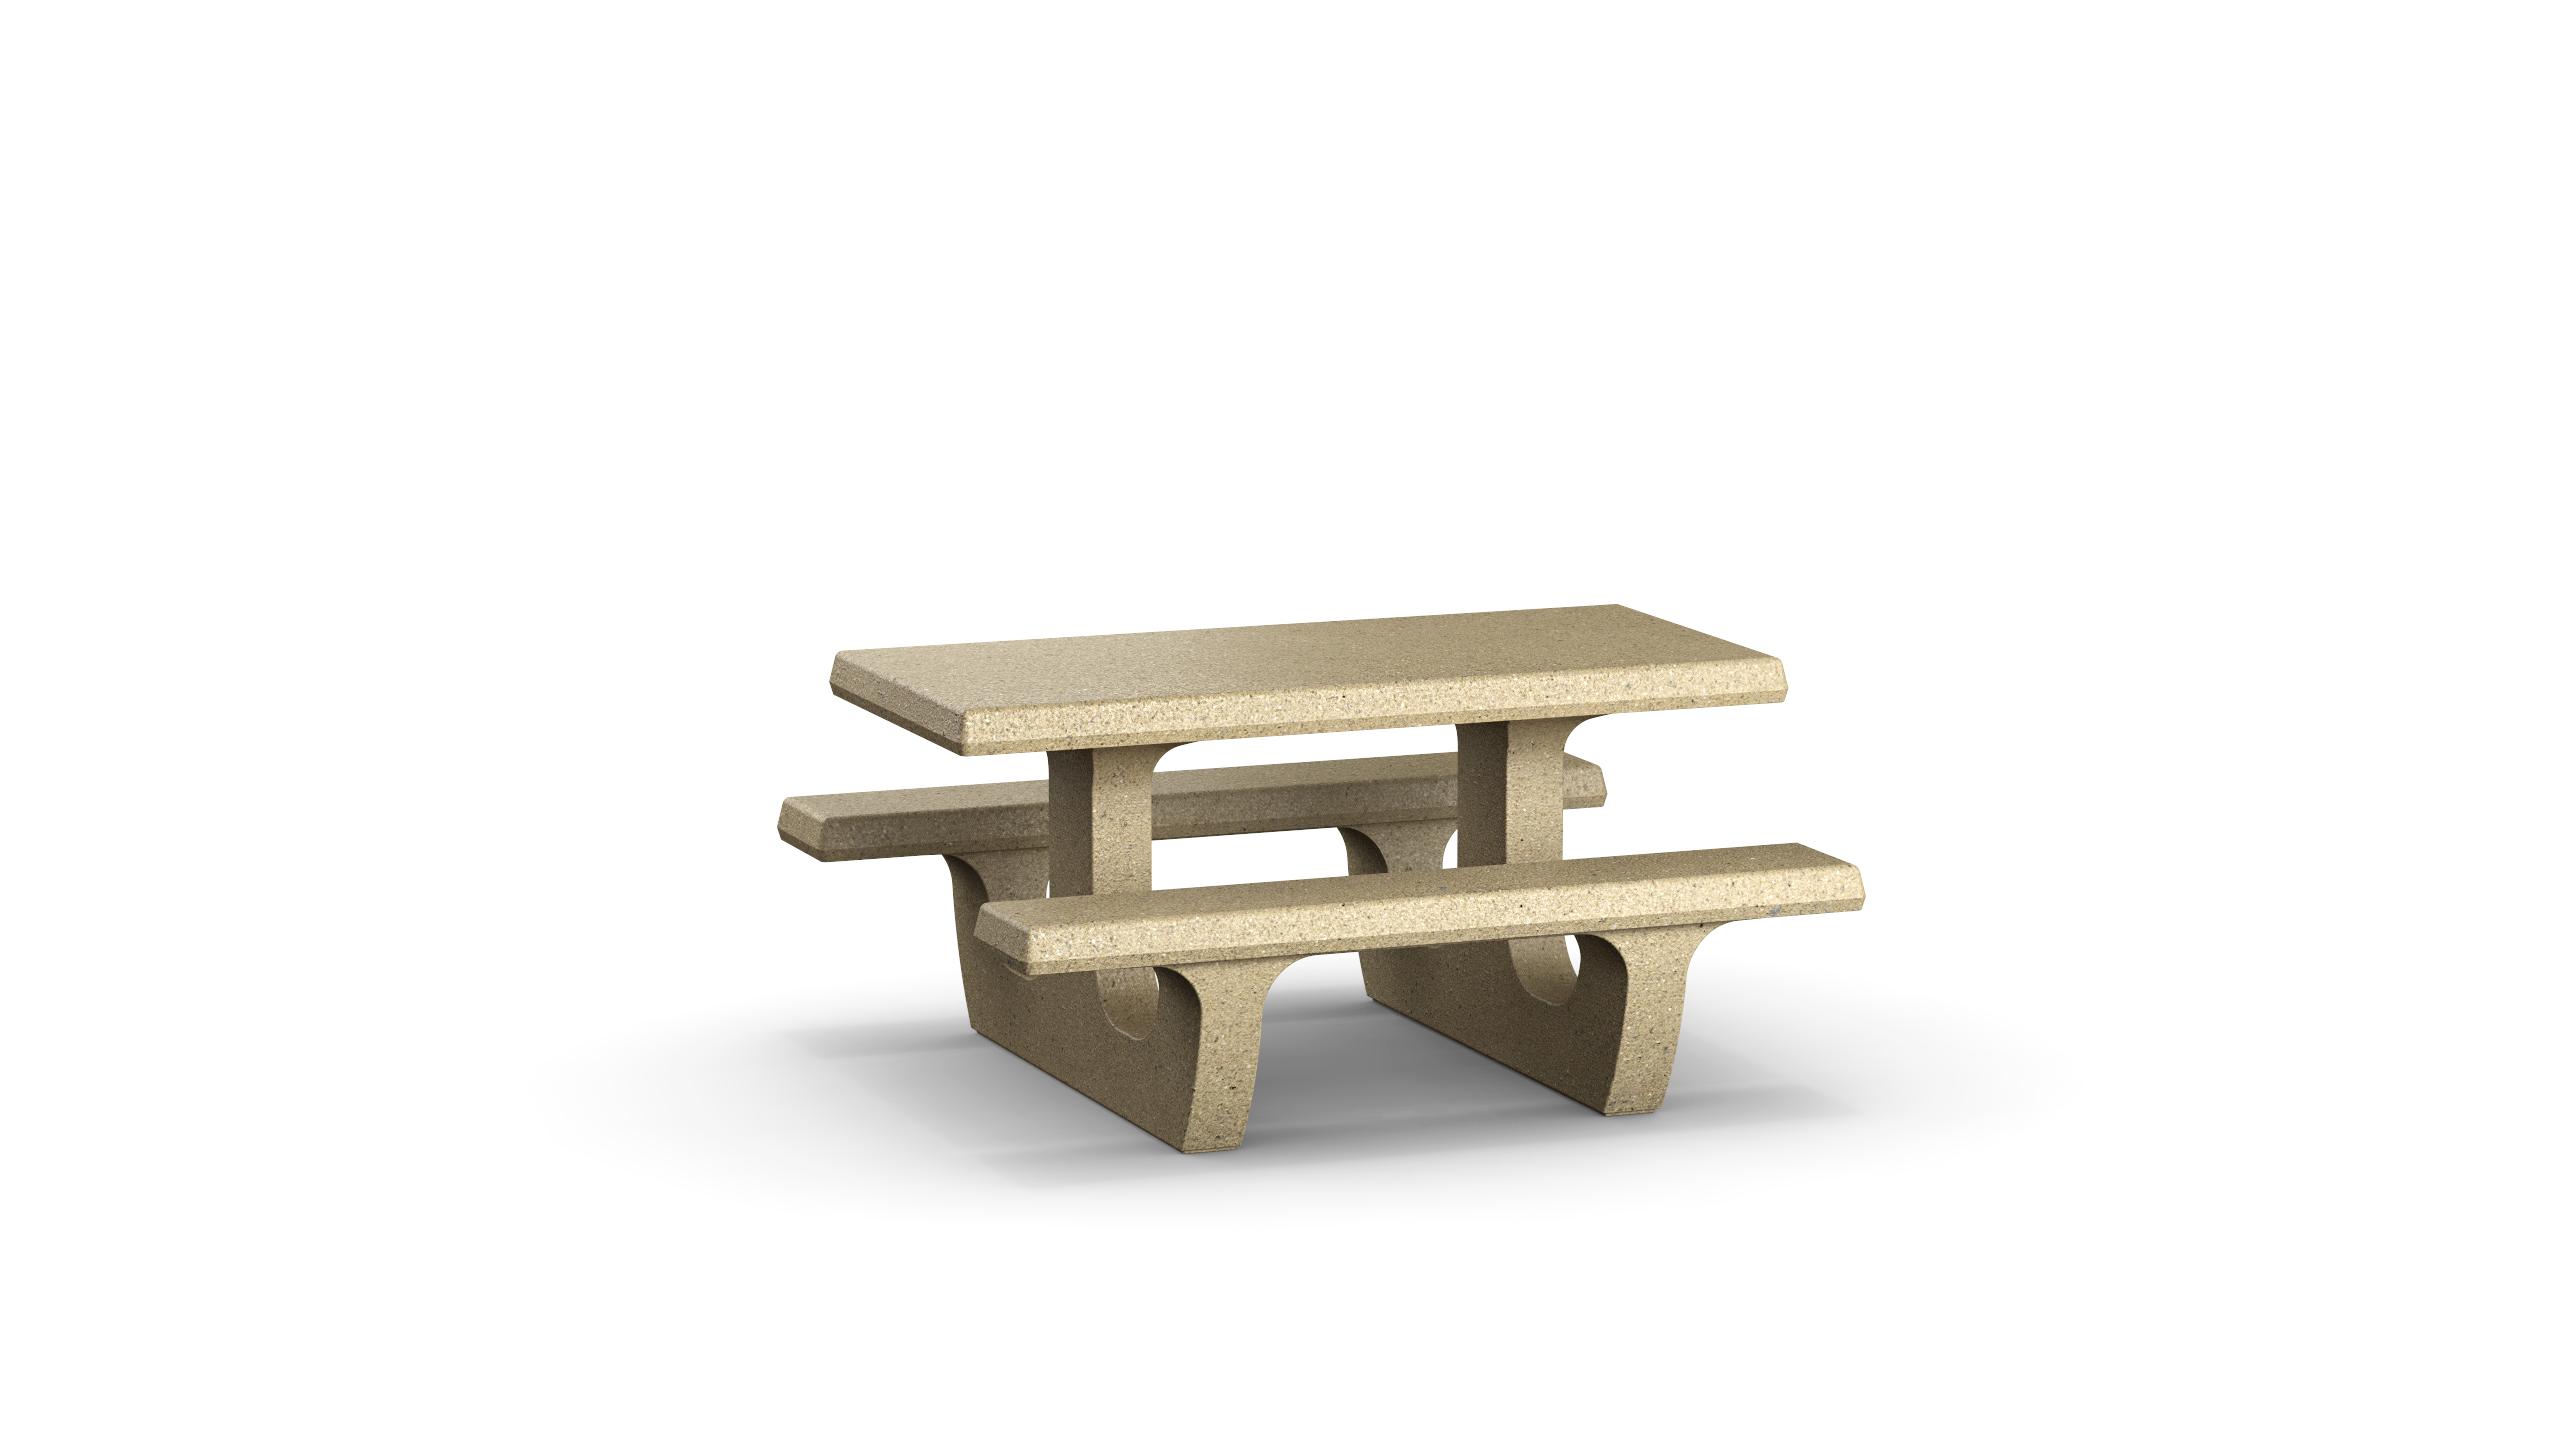 Lbt picnic tables qcp. Clipart table 3d table